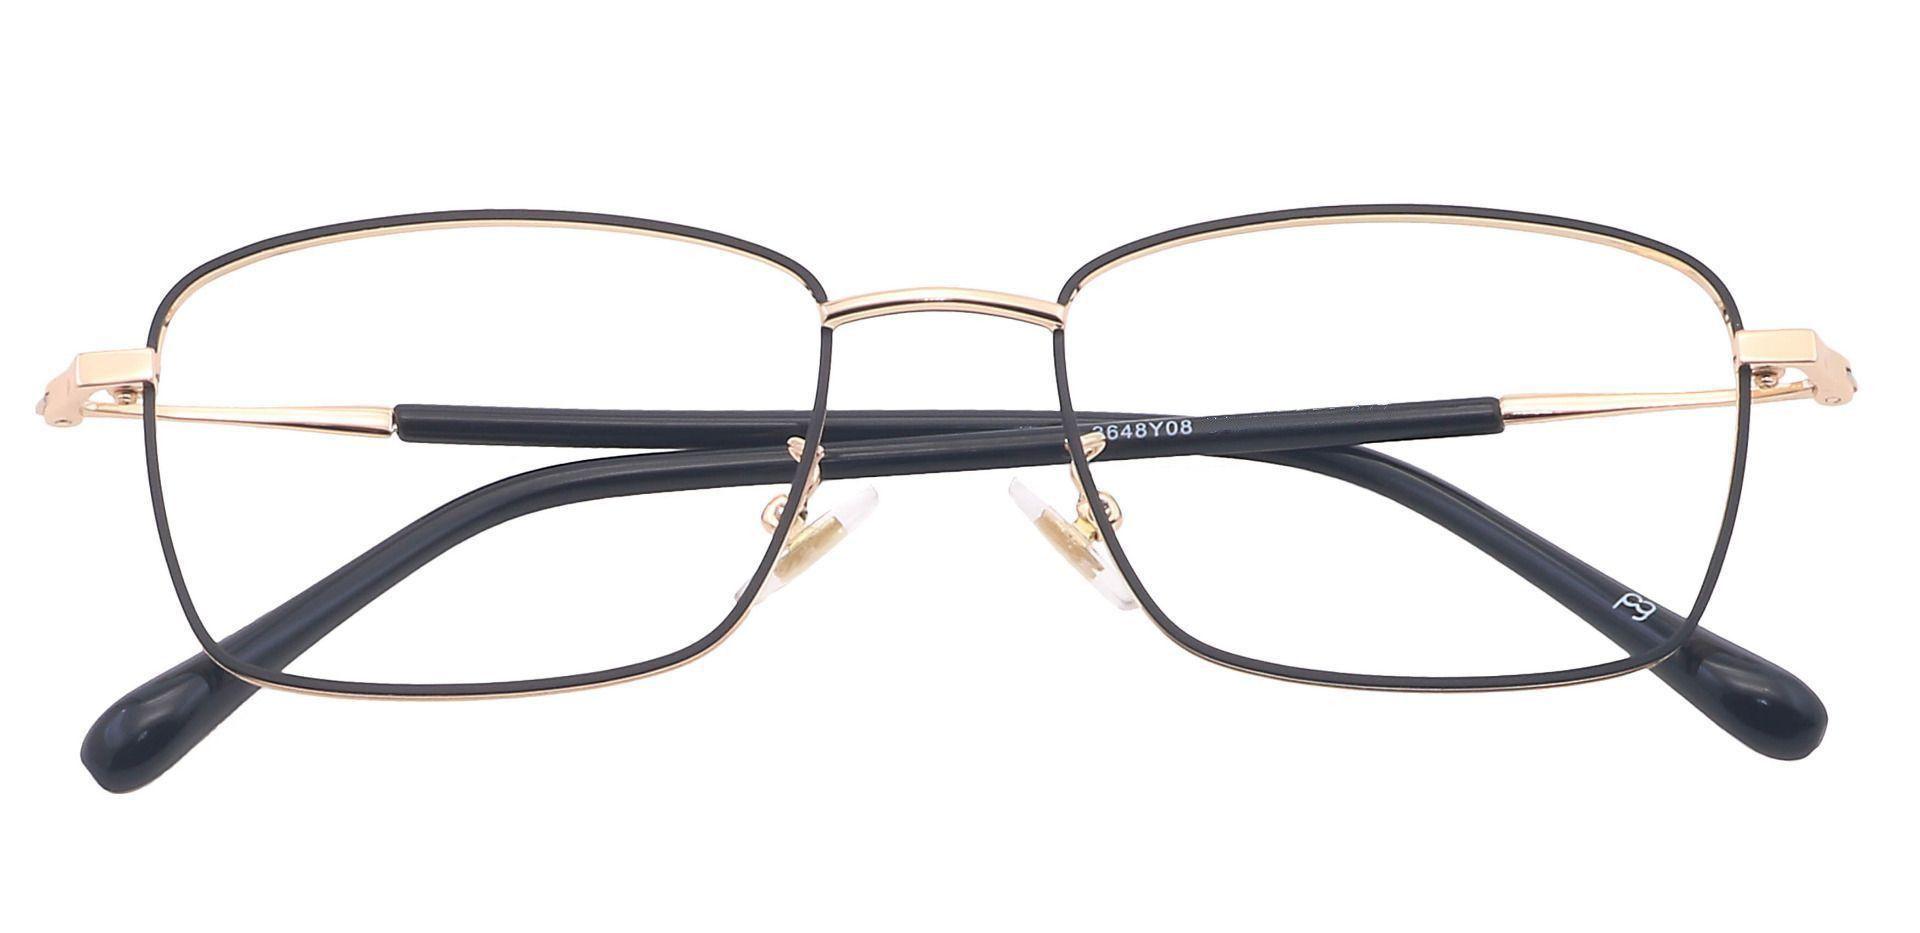 Diaz Rectangle Prescription Glasses - Yellow